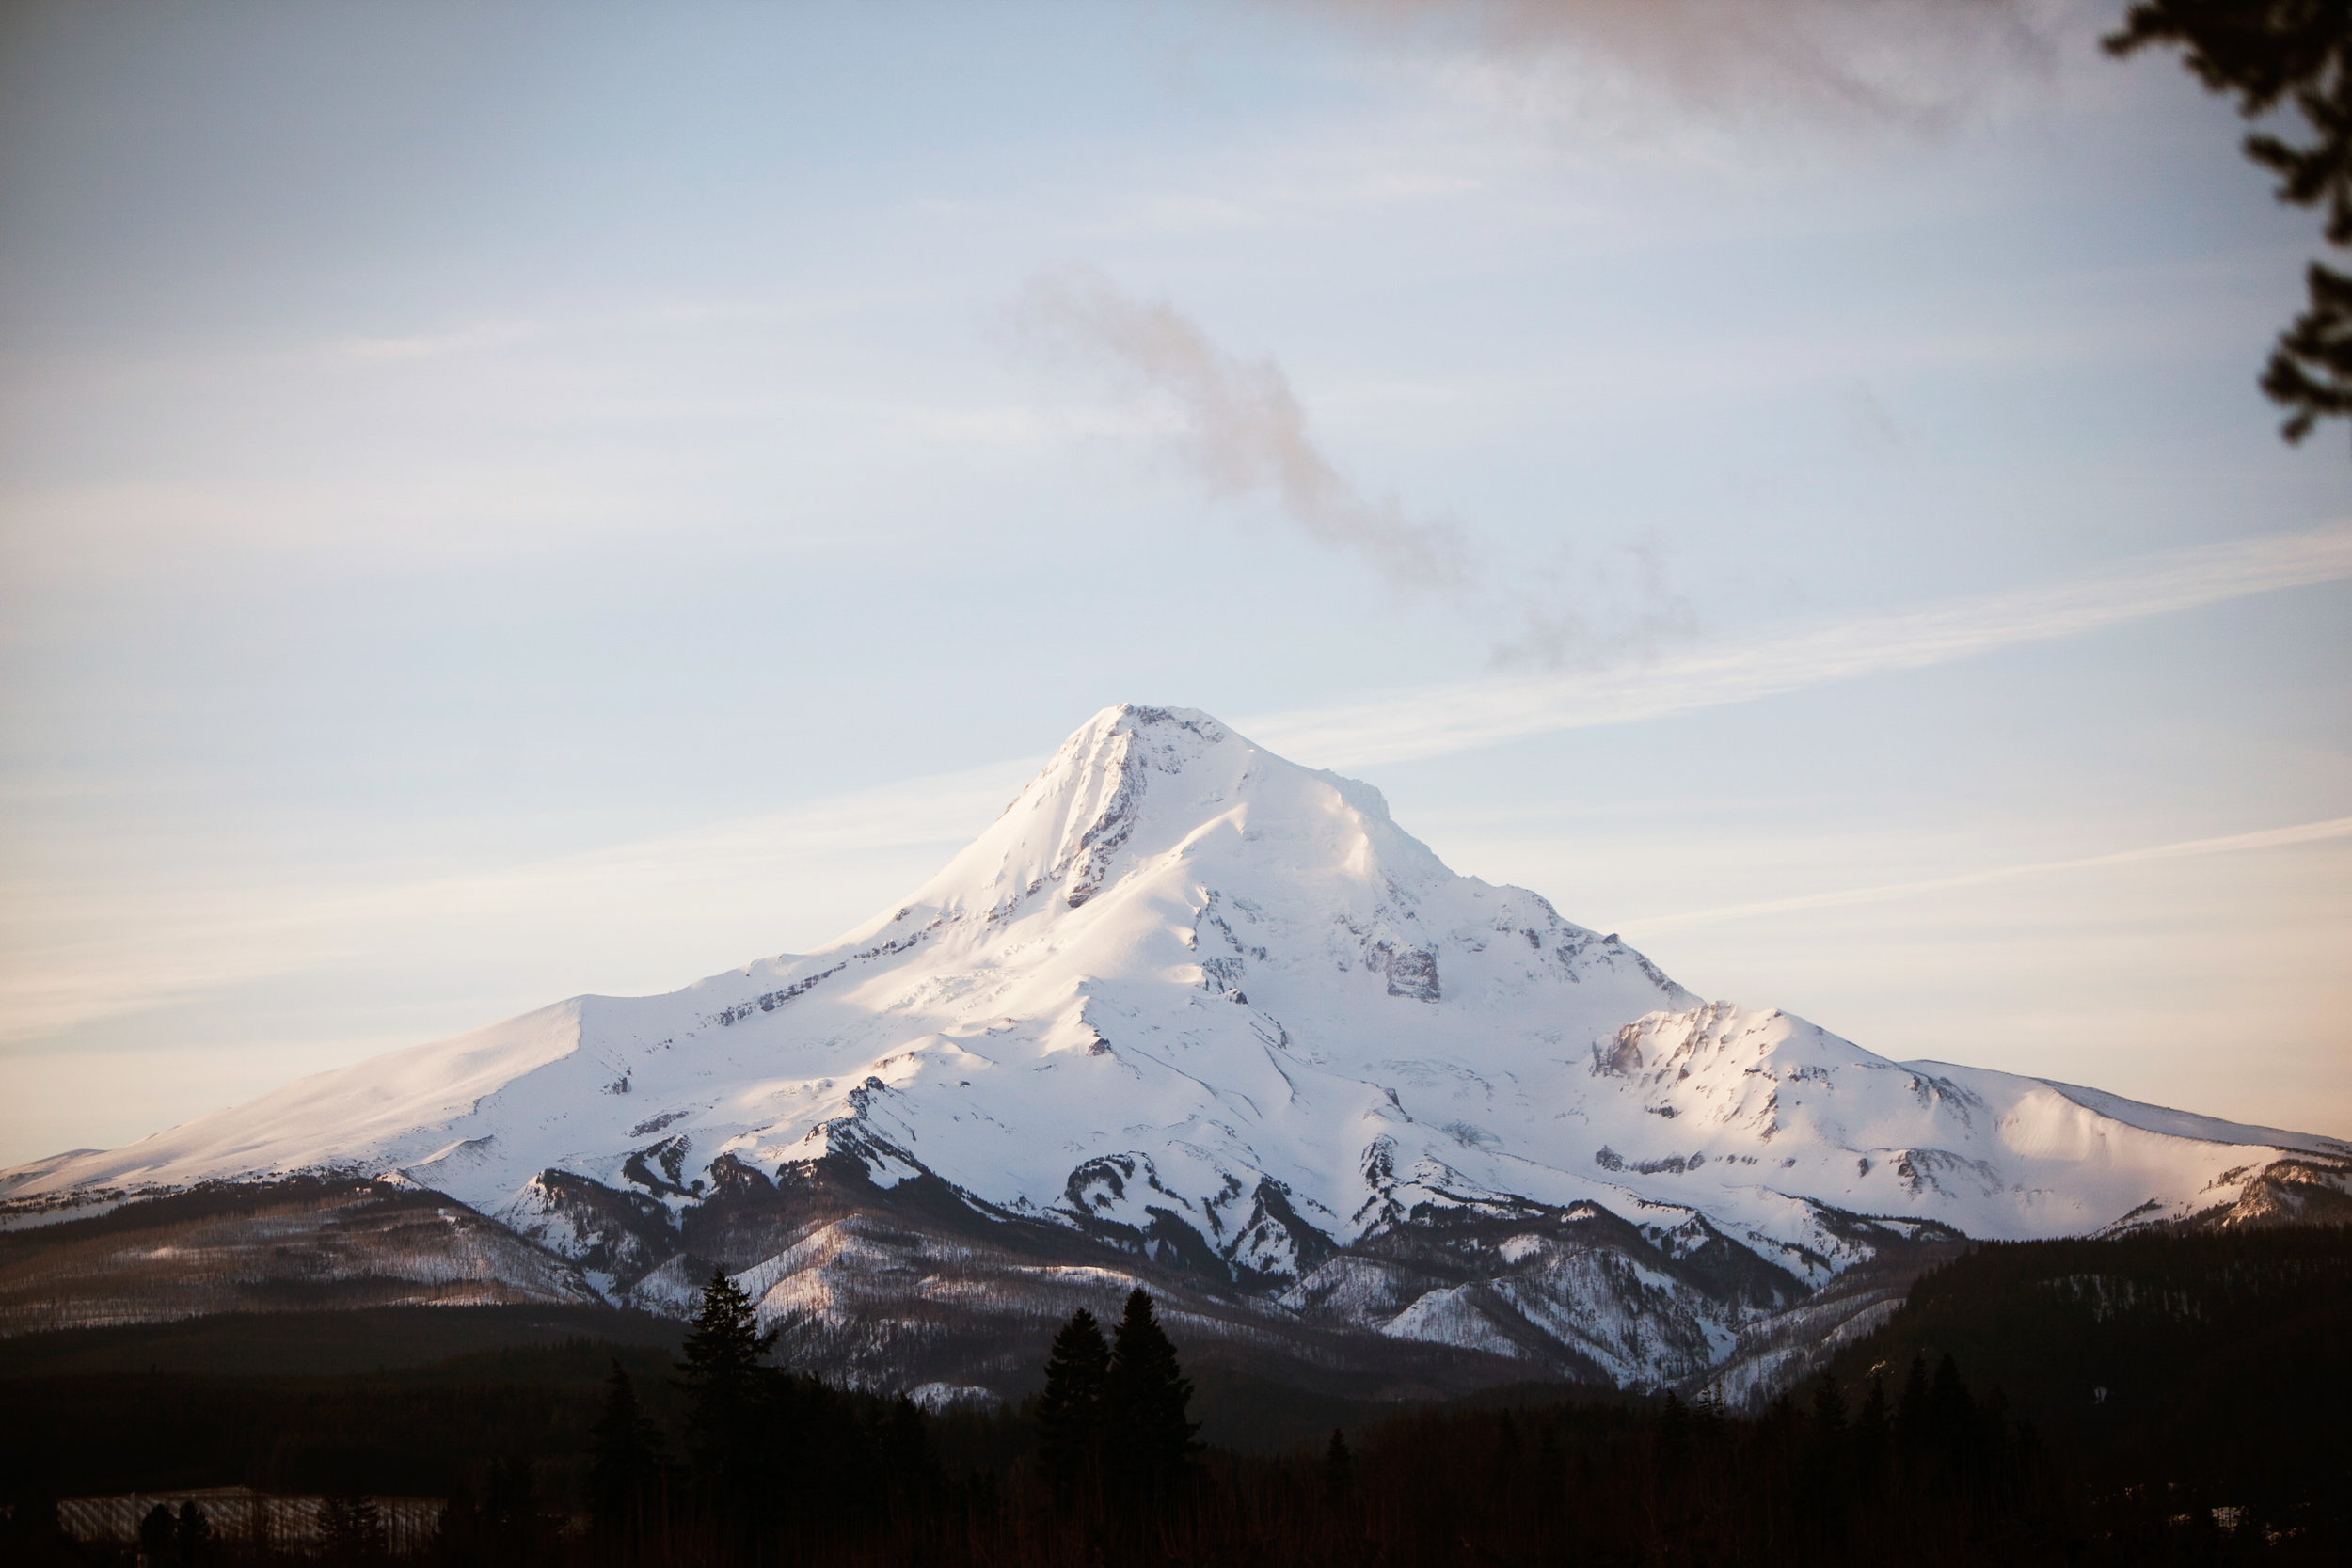 067Travel_Adventure_Outdoor_Photography_Outlive_Creative_Oregon_Mount_Hood.jpg